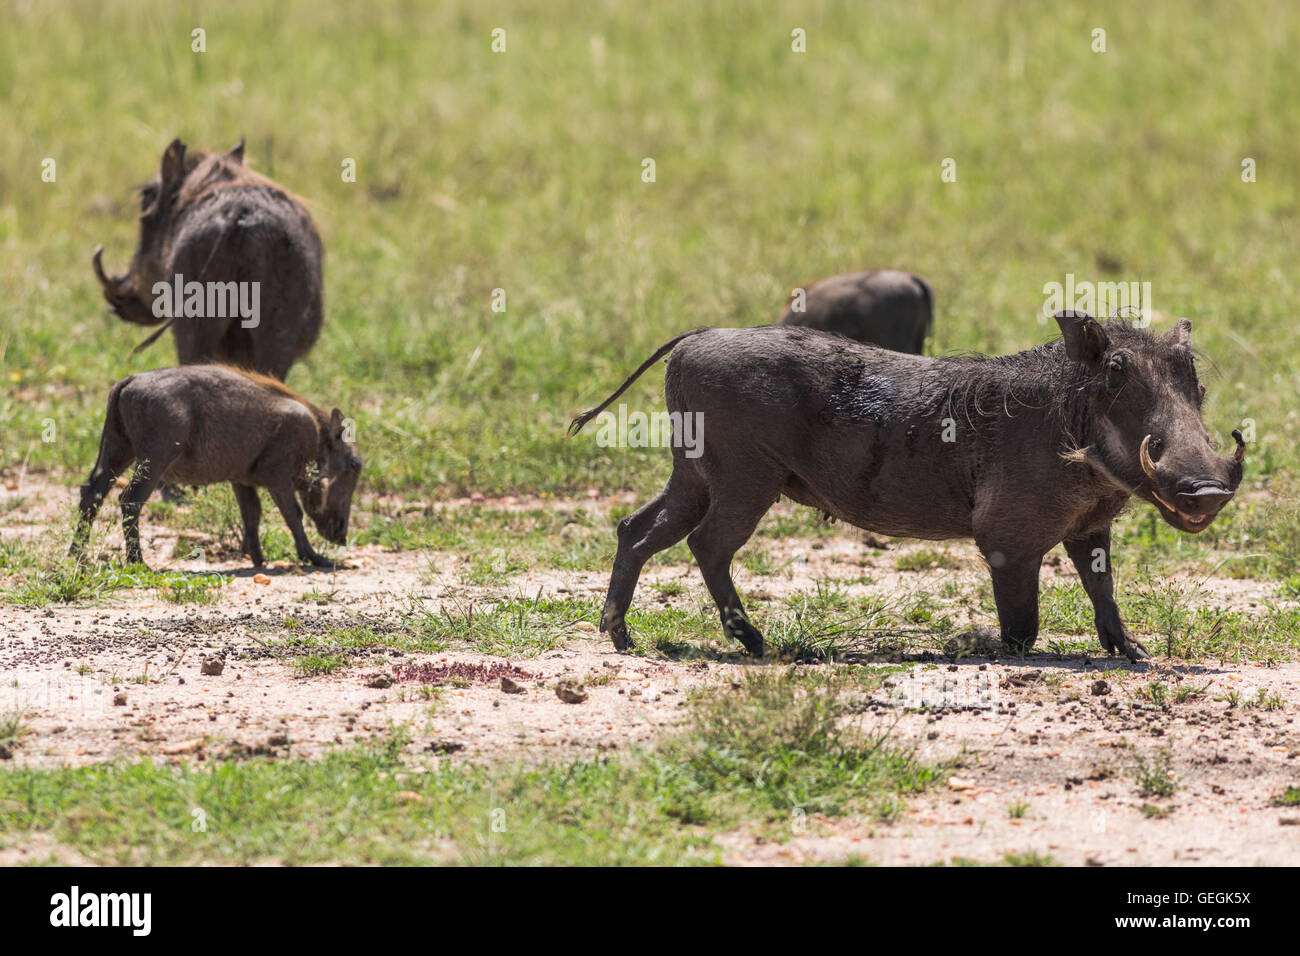 Four wart hogs on the savanna in Masai Mara, Kenya, Africa - Stock Image